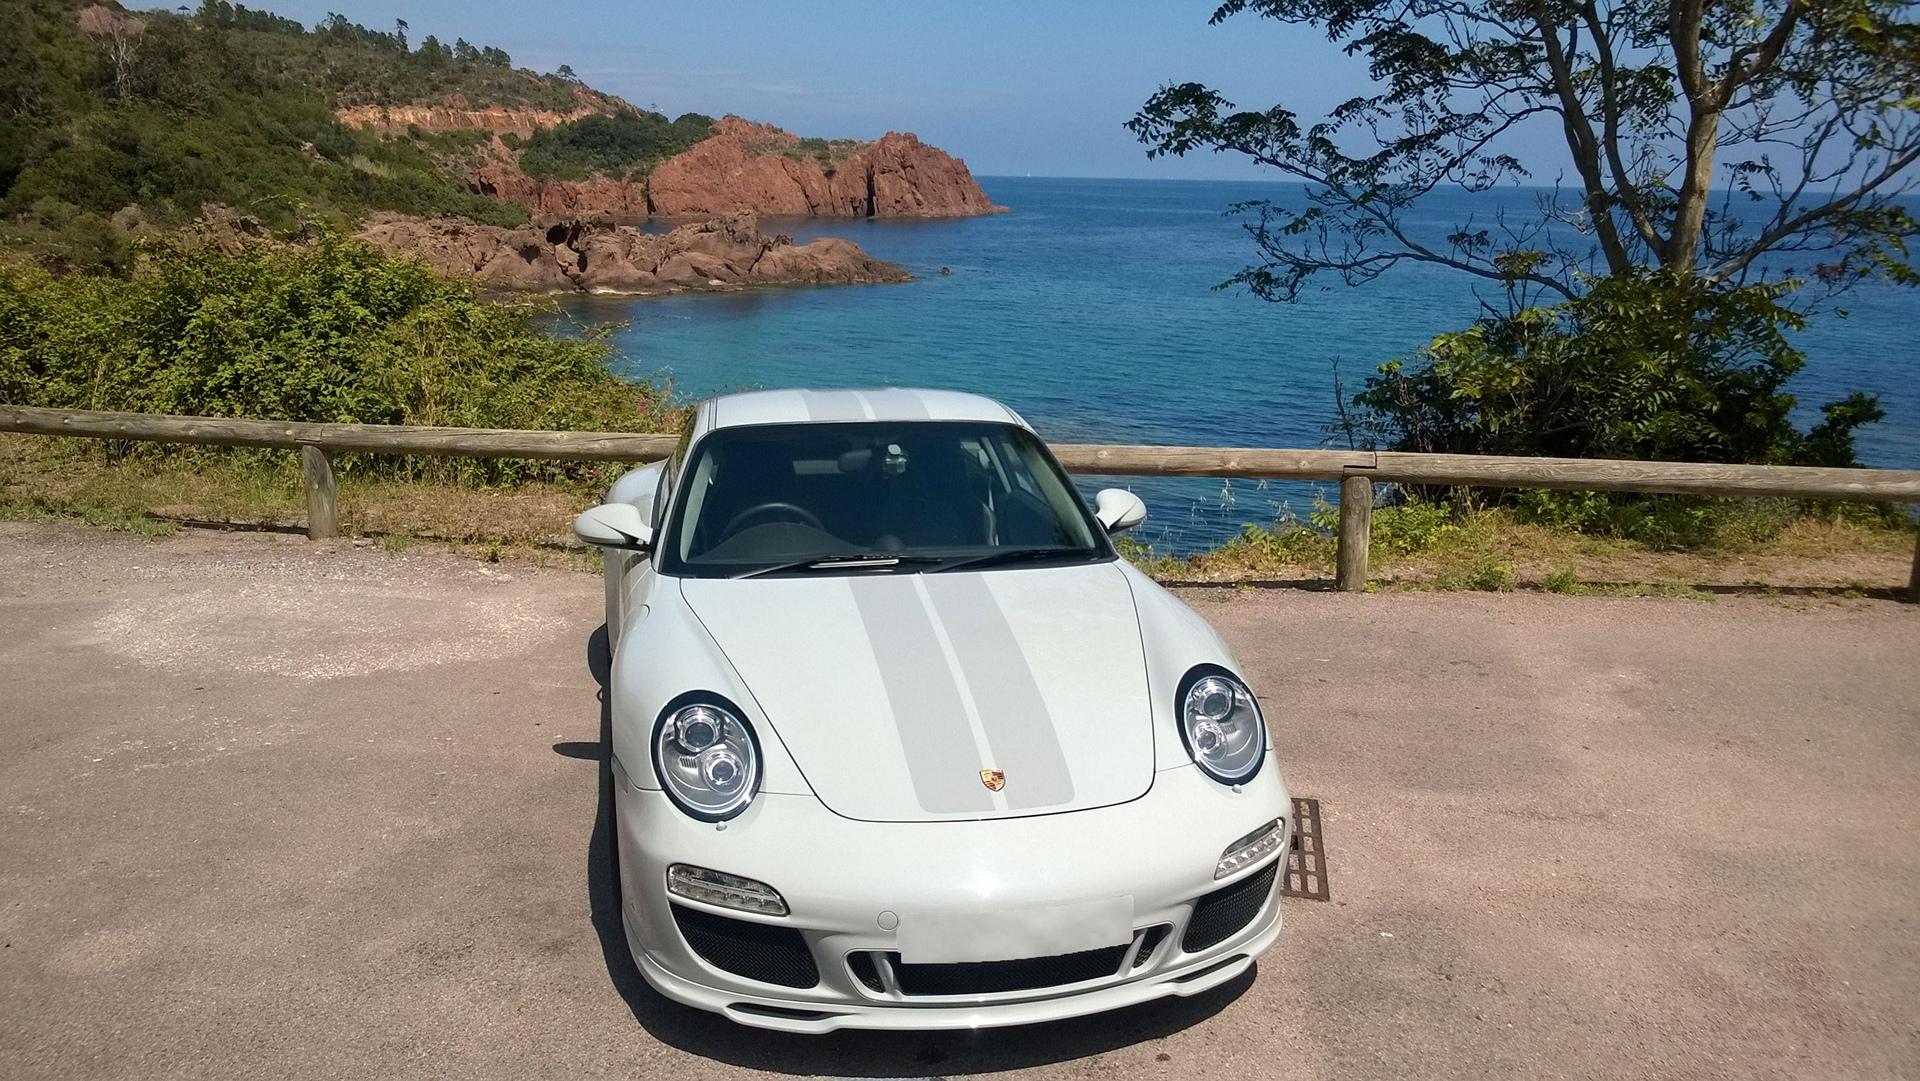 Porsche 911 Sport Classic in Cannes © Dr. Ing. h.c. F. Porsche AG